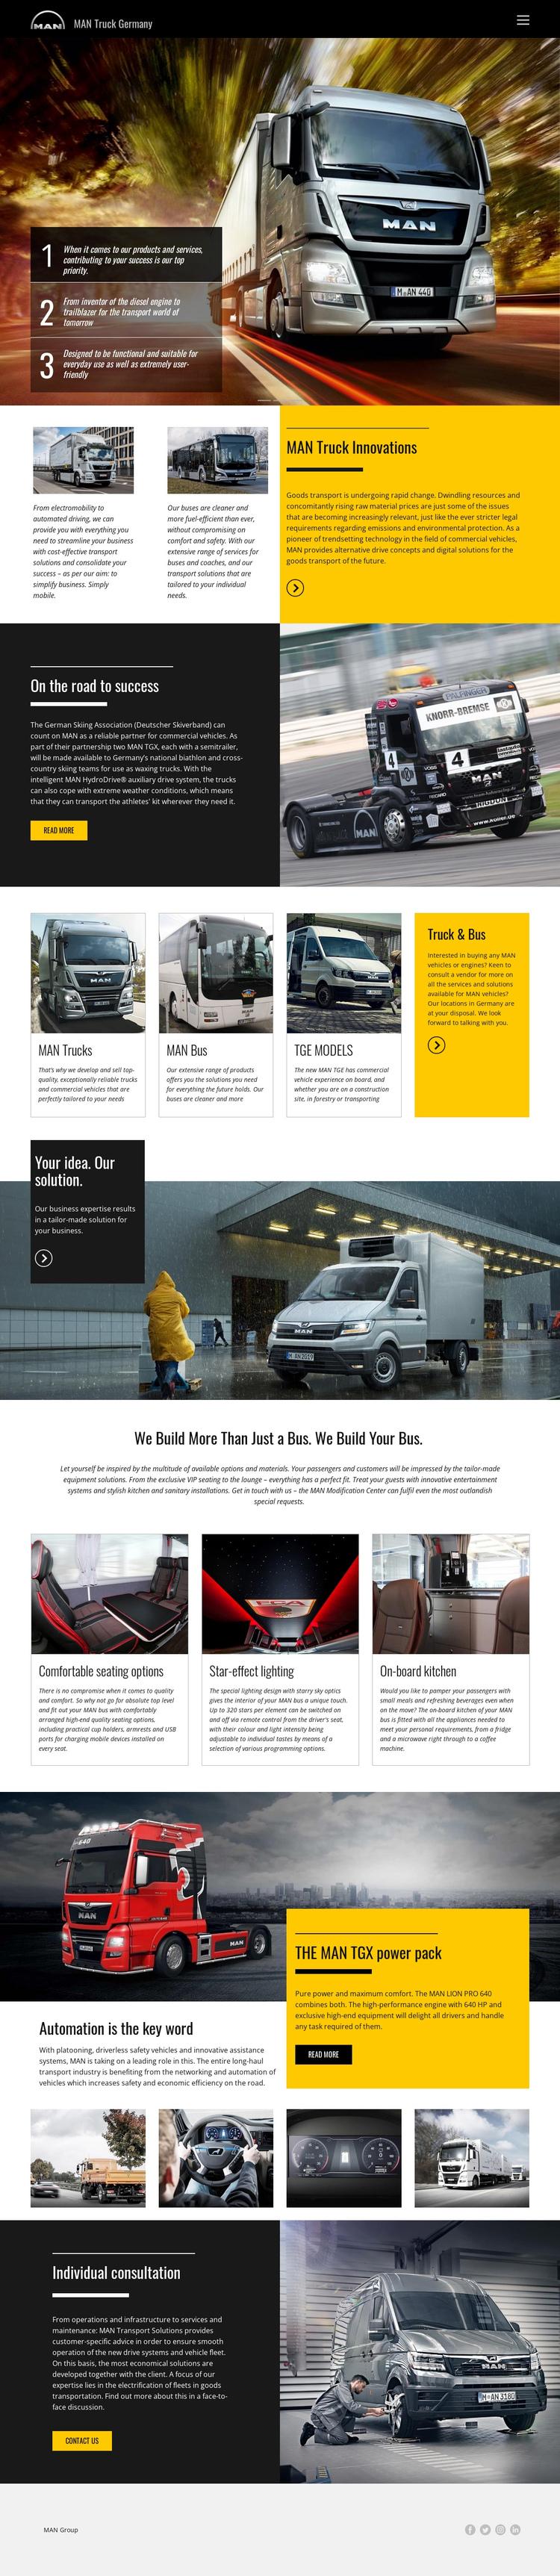 Man trucks for transportation Website Builder Software